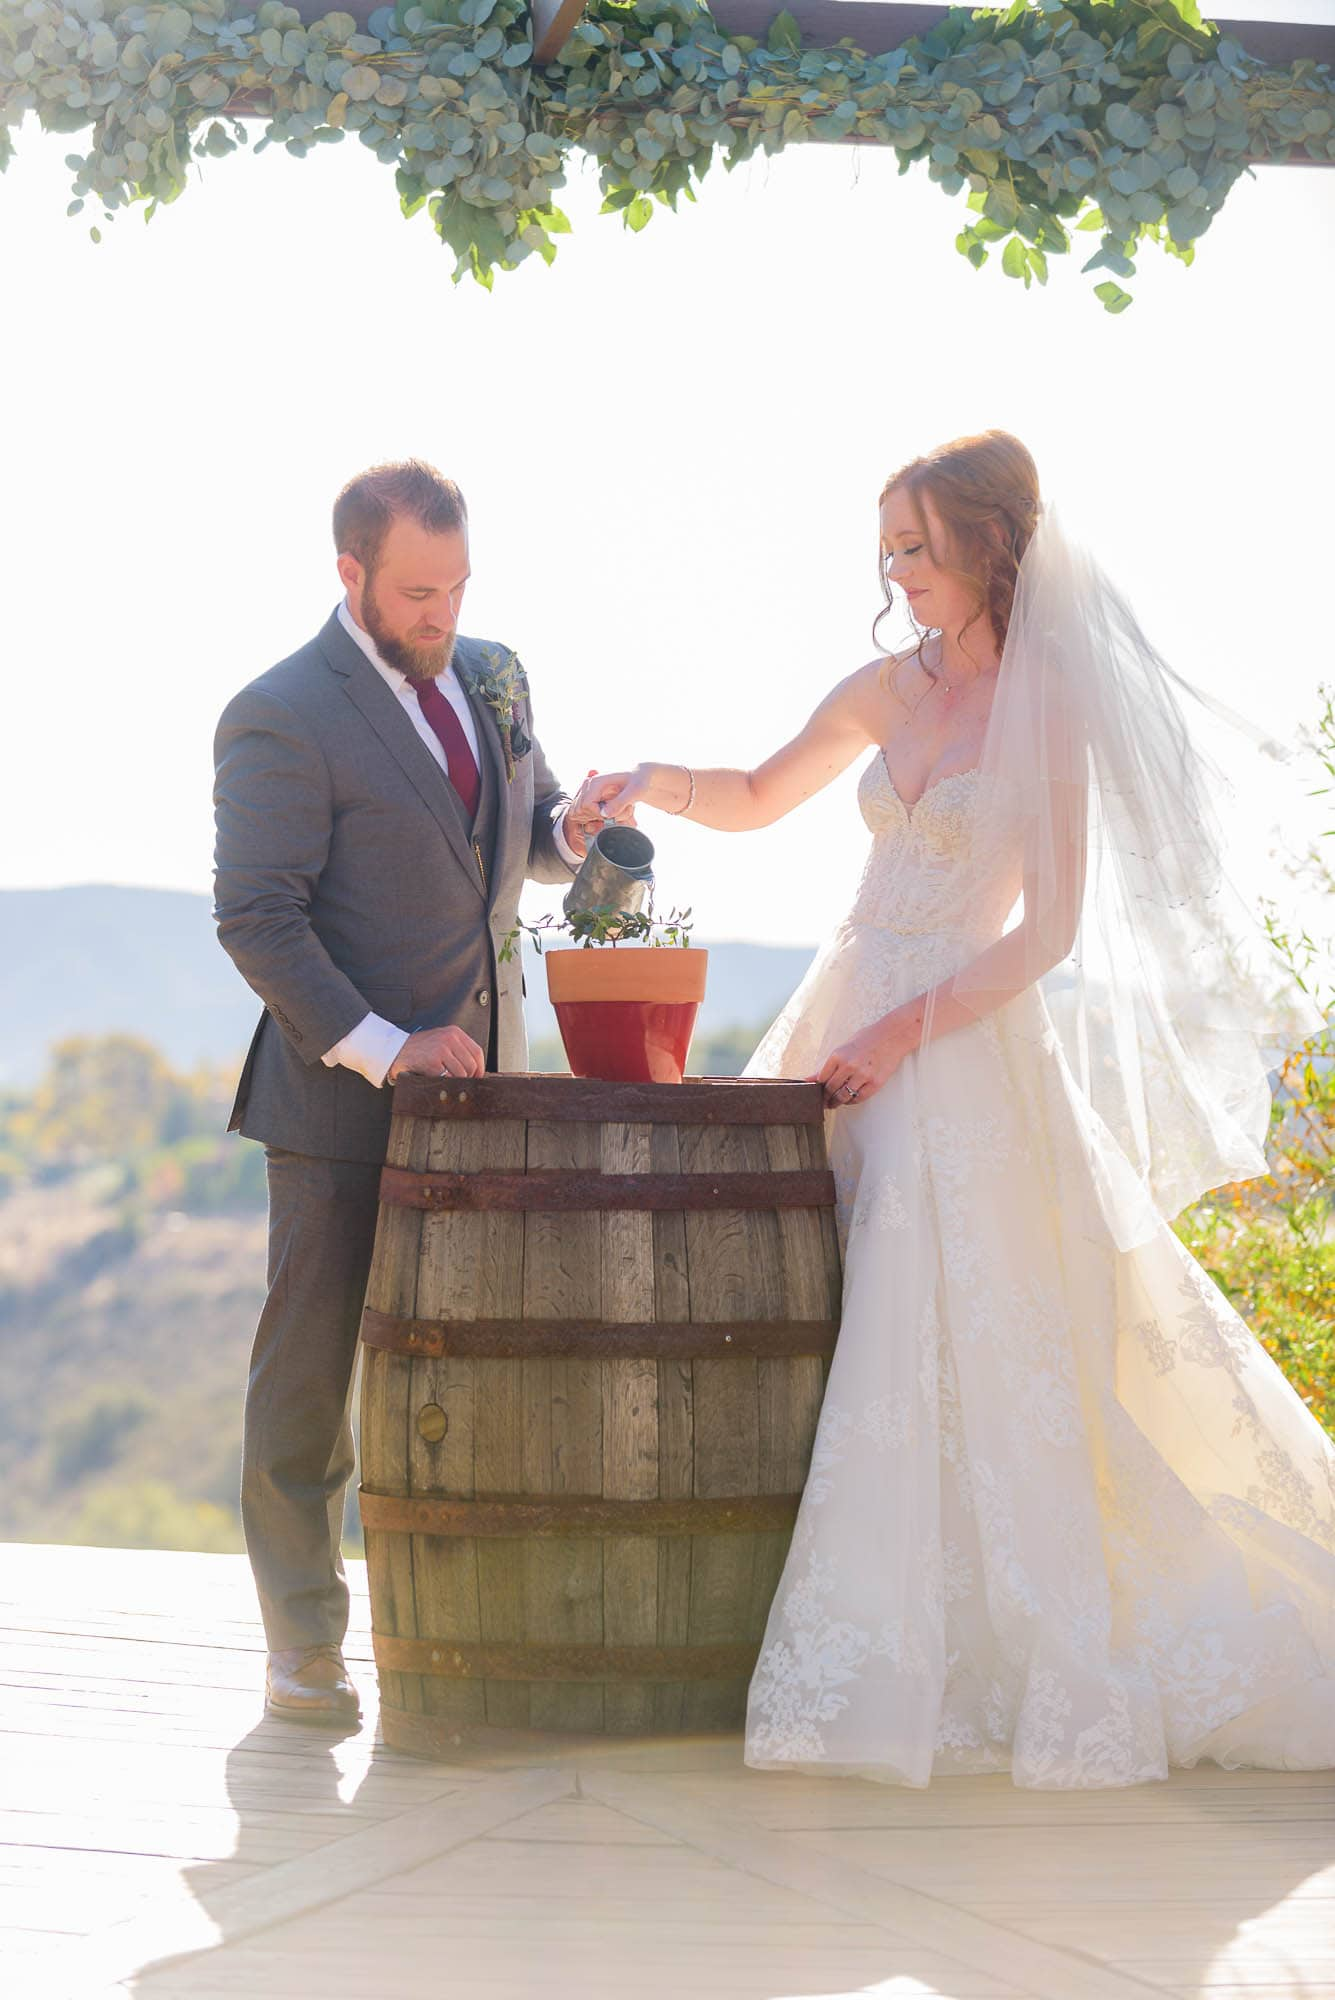 243_Alan_and_Heidi_Serendipity_Garden_Wedding_10-27-2018